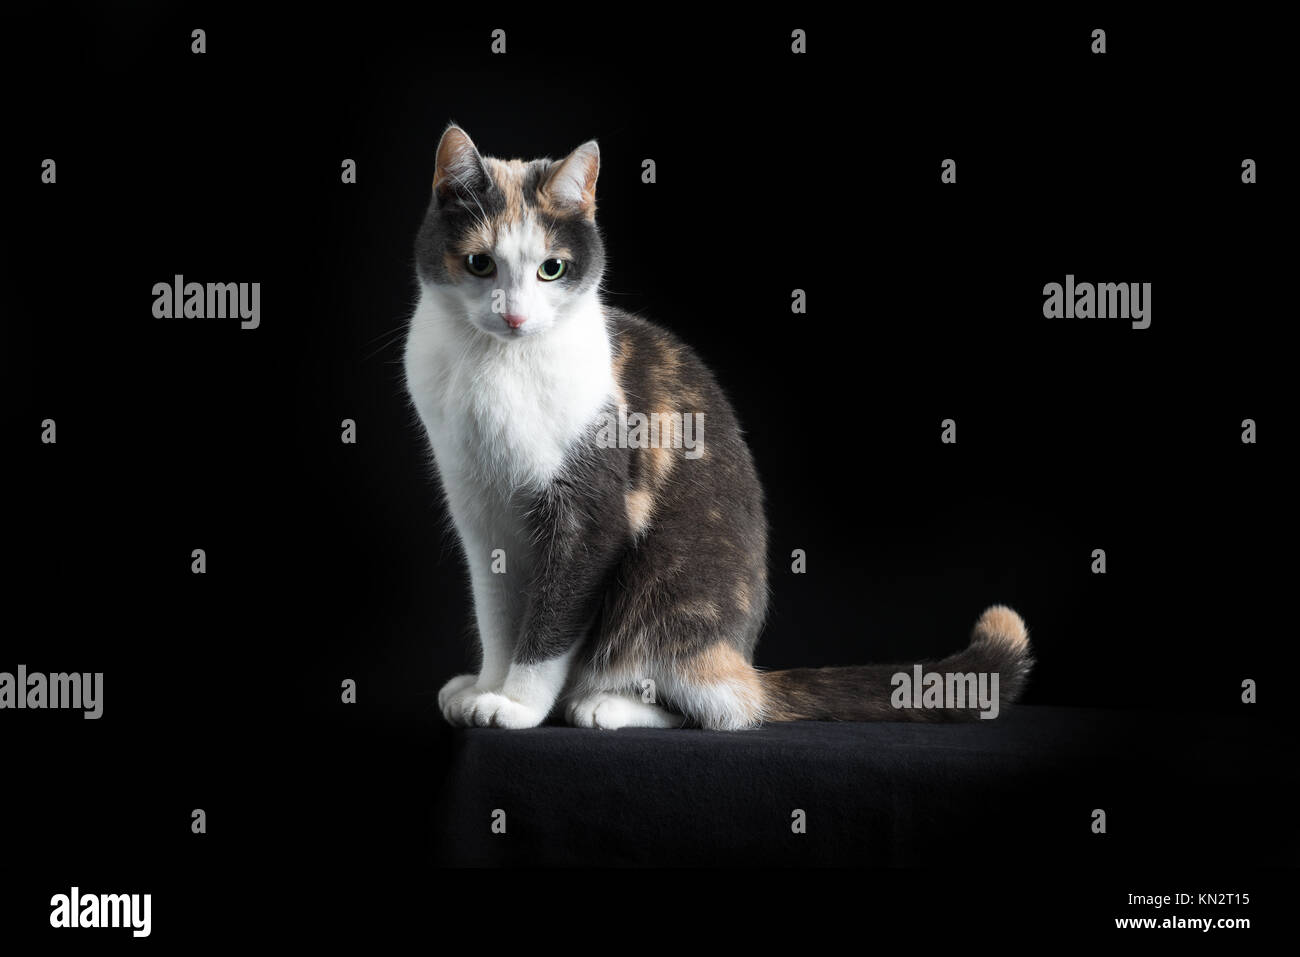 European Shorthair Cat Stock s & European Shorthair Cat Stock